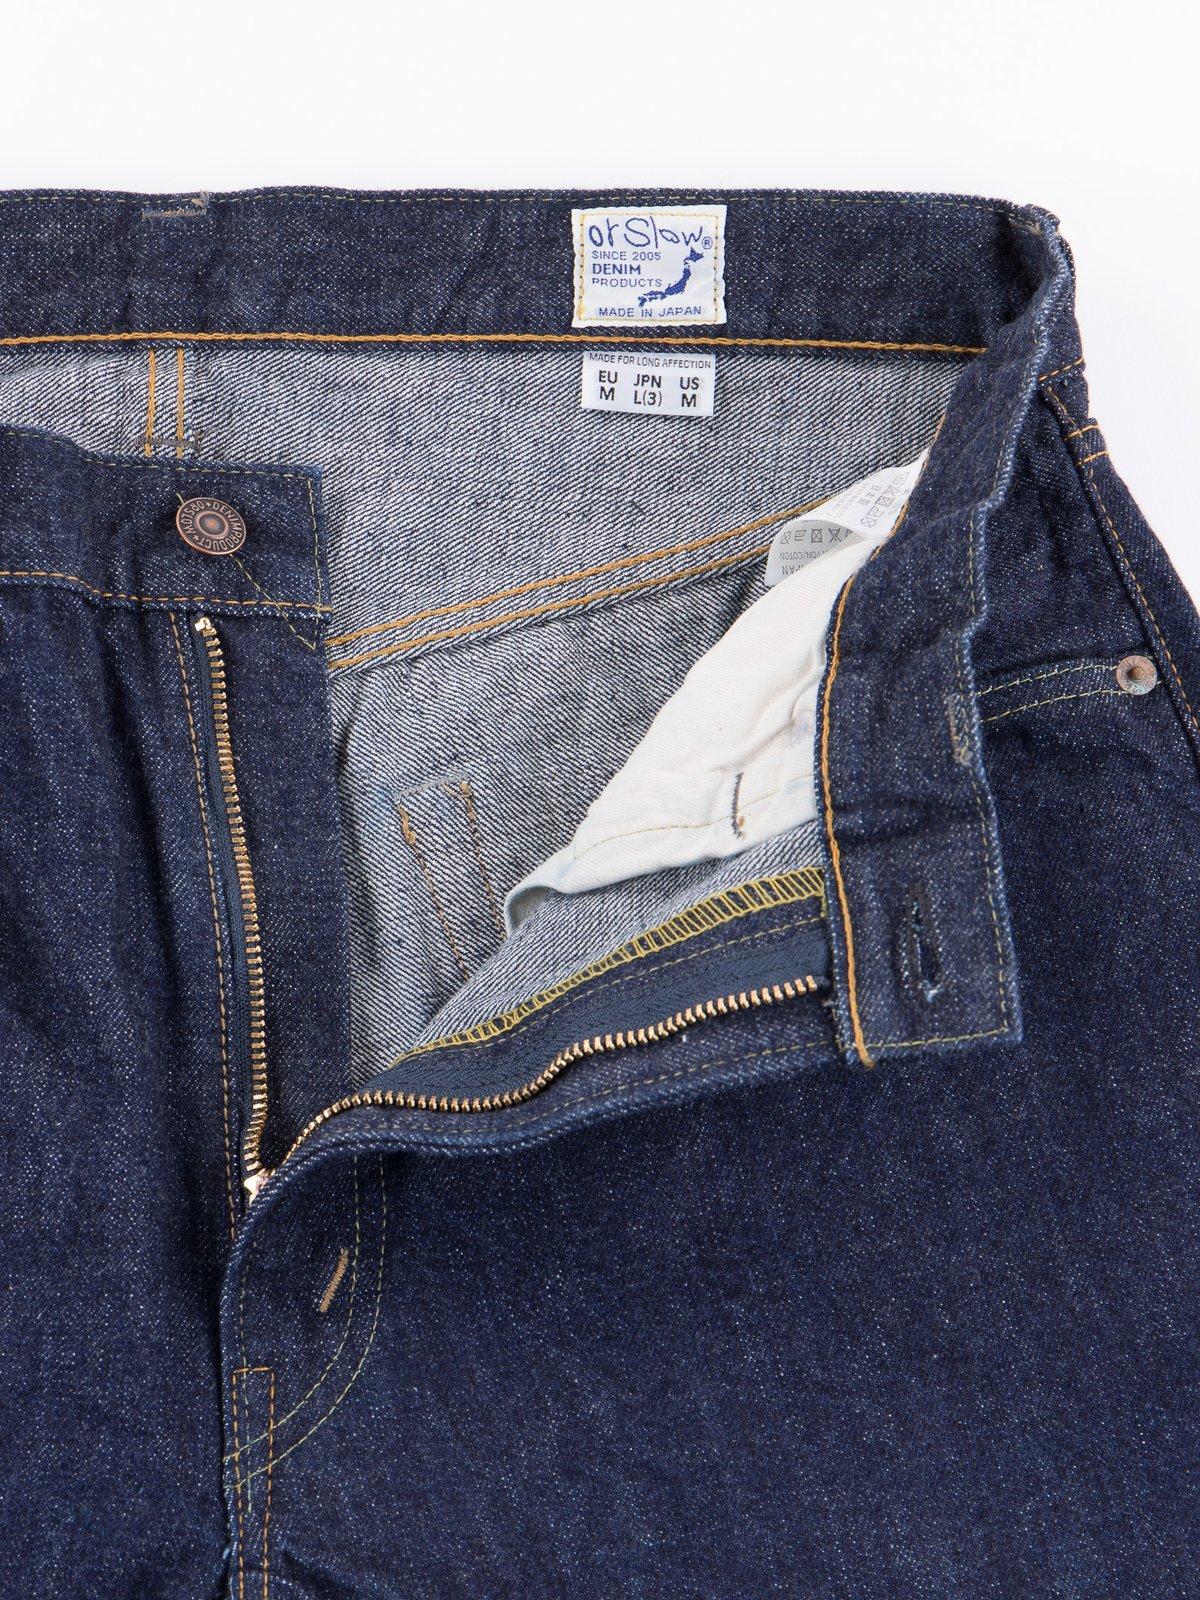 One Wash 107 Slim Fit Jean - Image 4